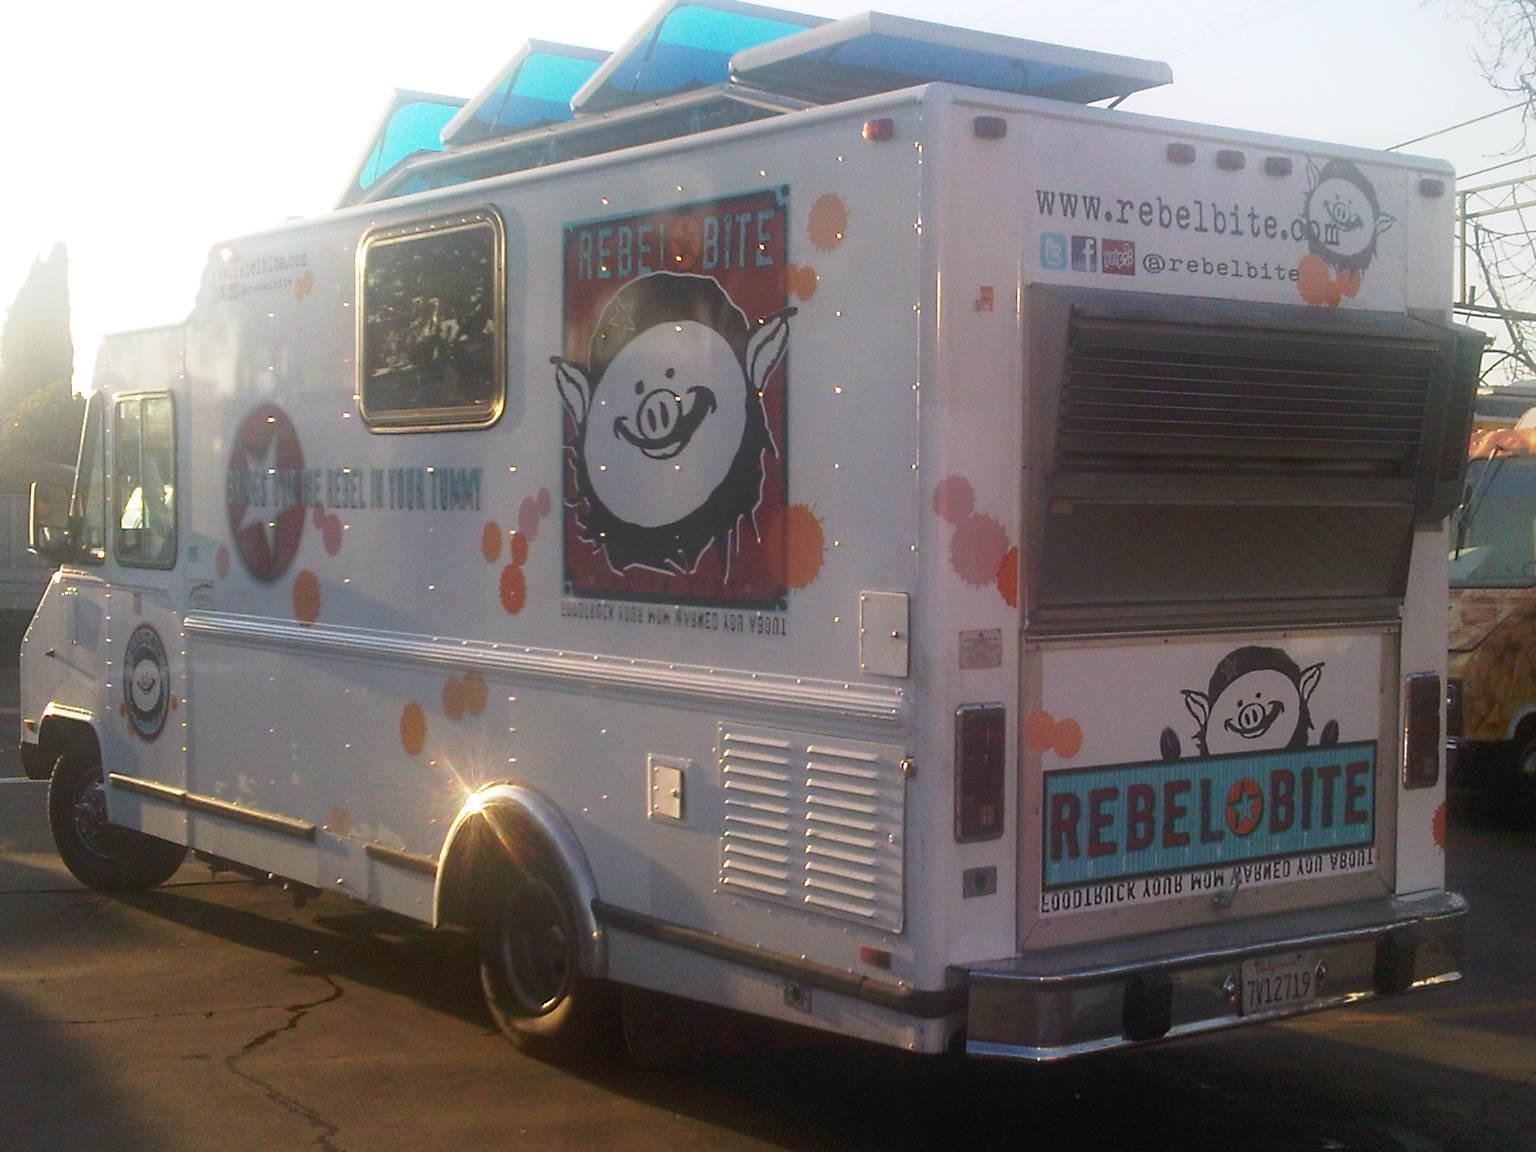 Chicken Rebel Food Truck